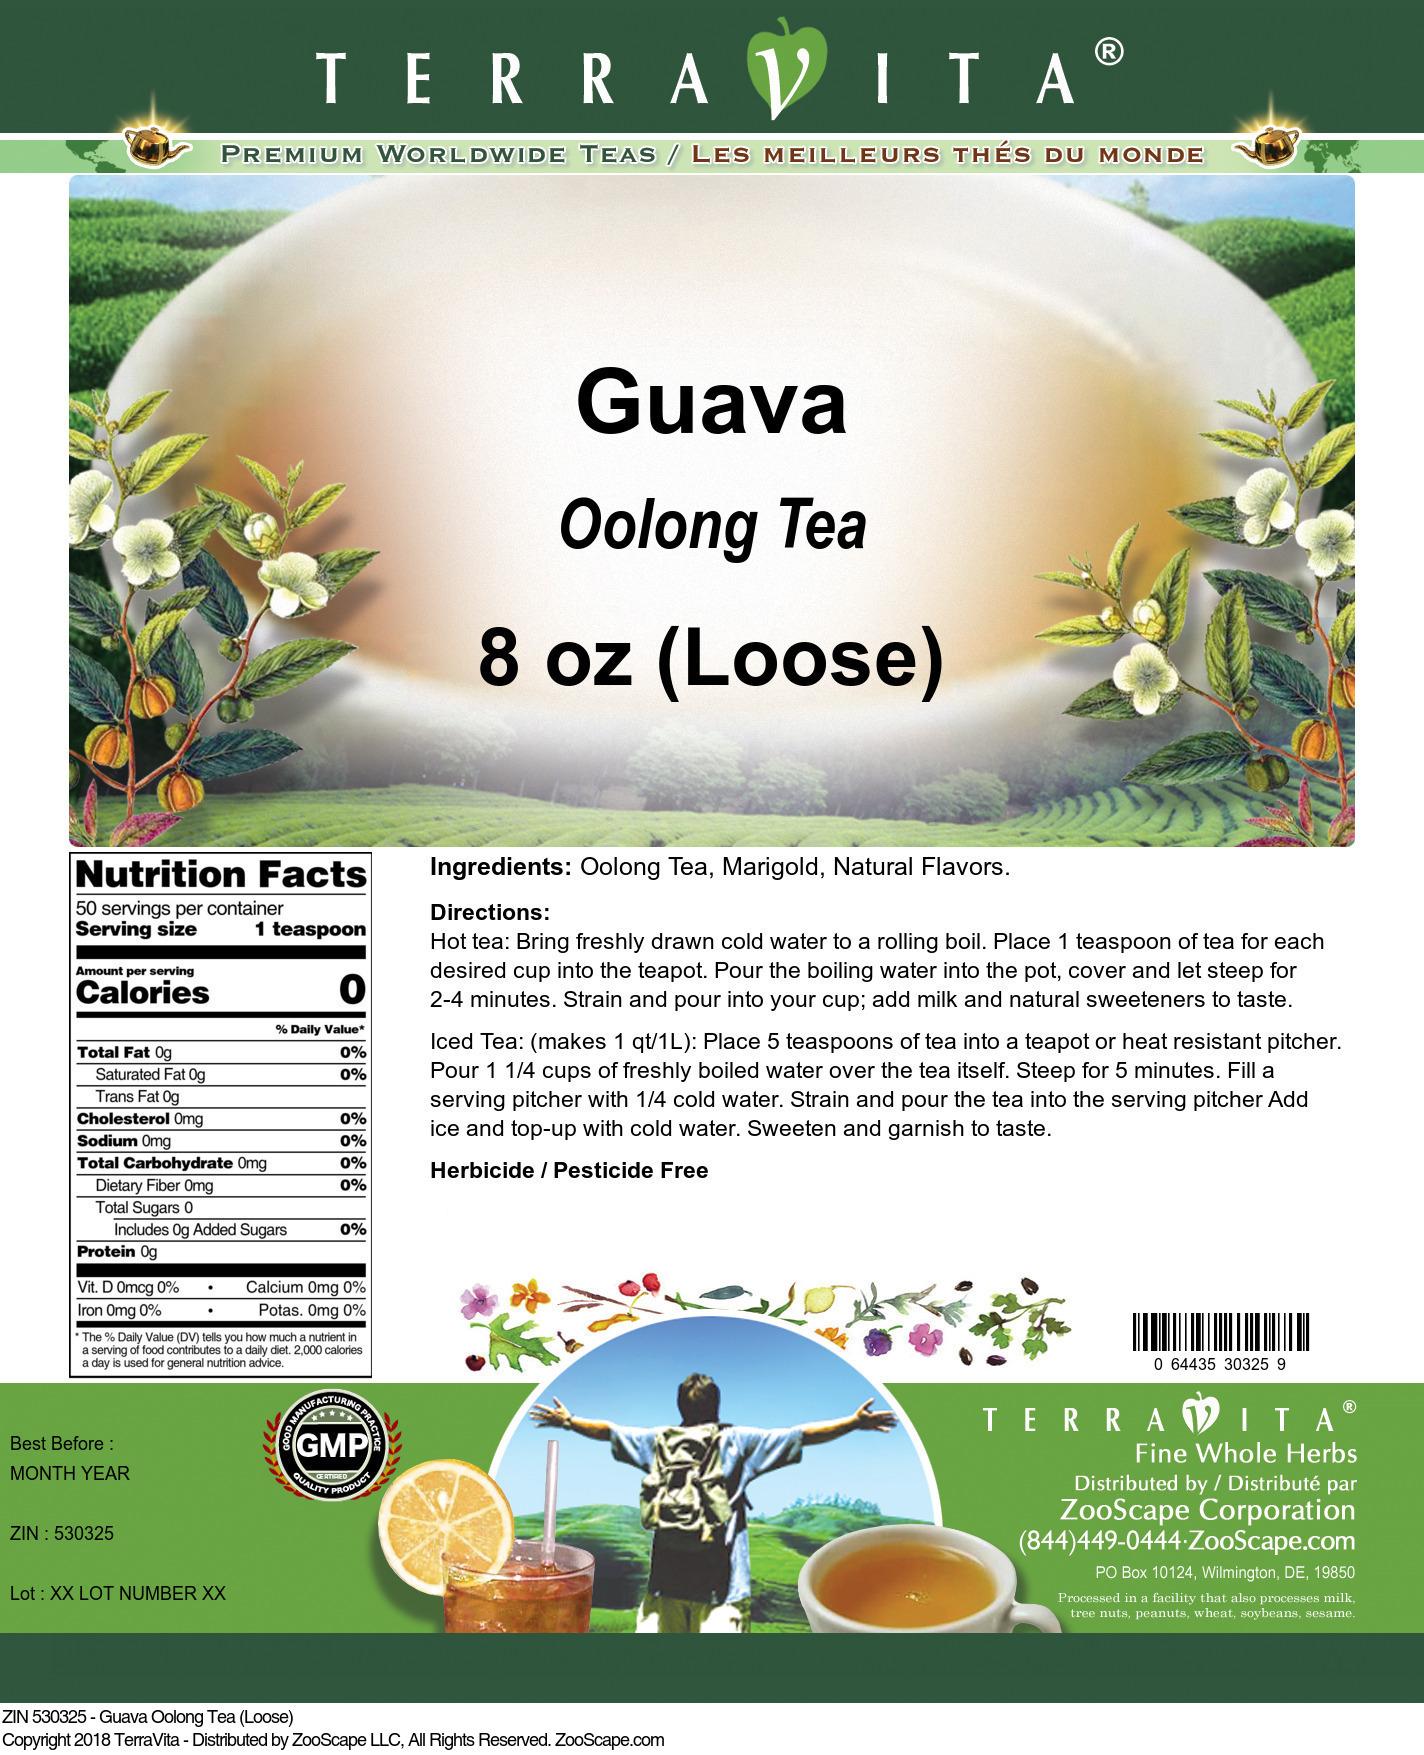 Guava Oolong Tea (Loose)